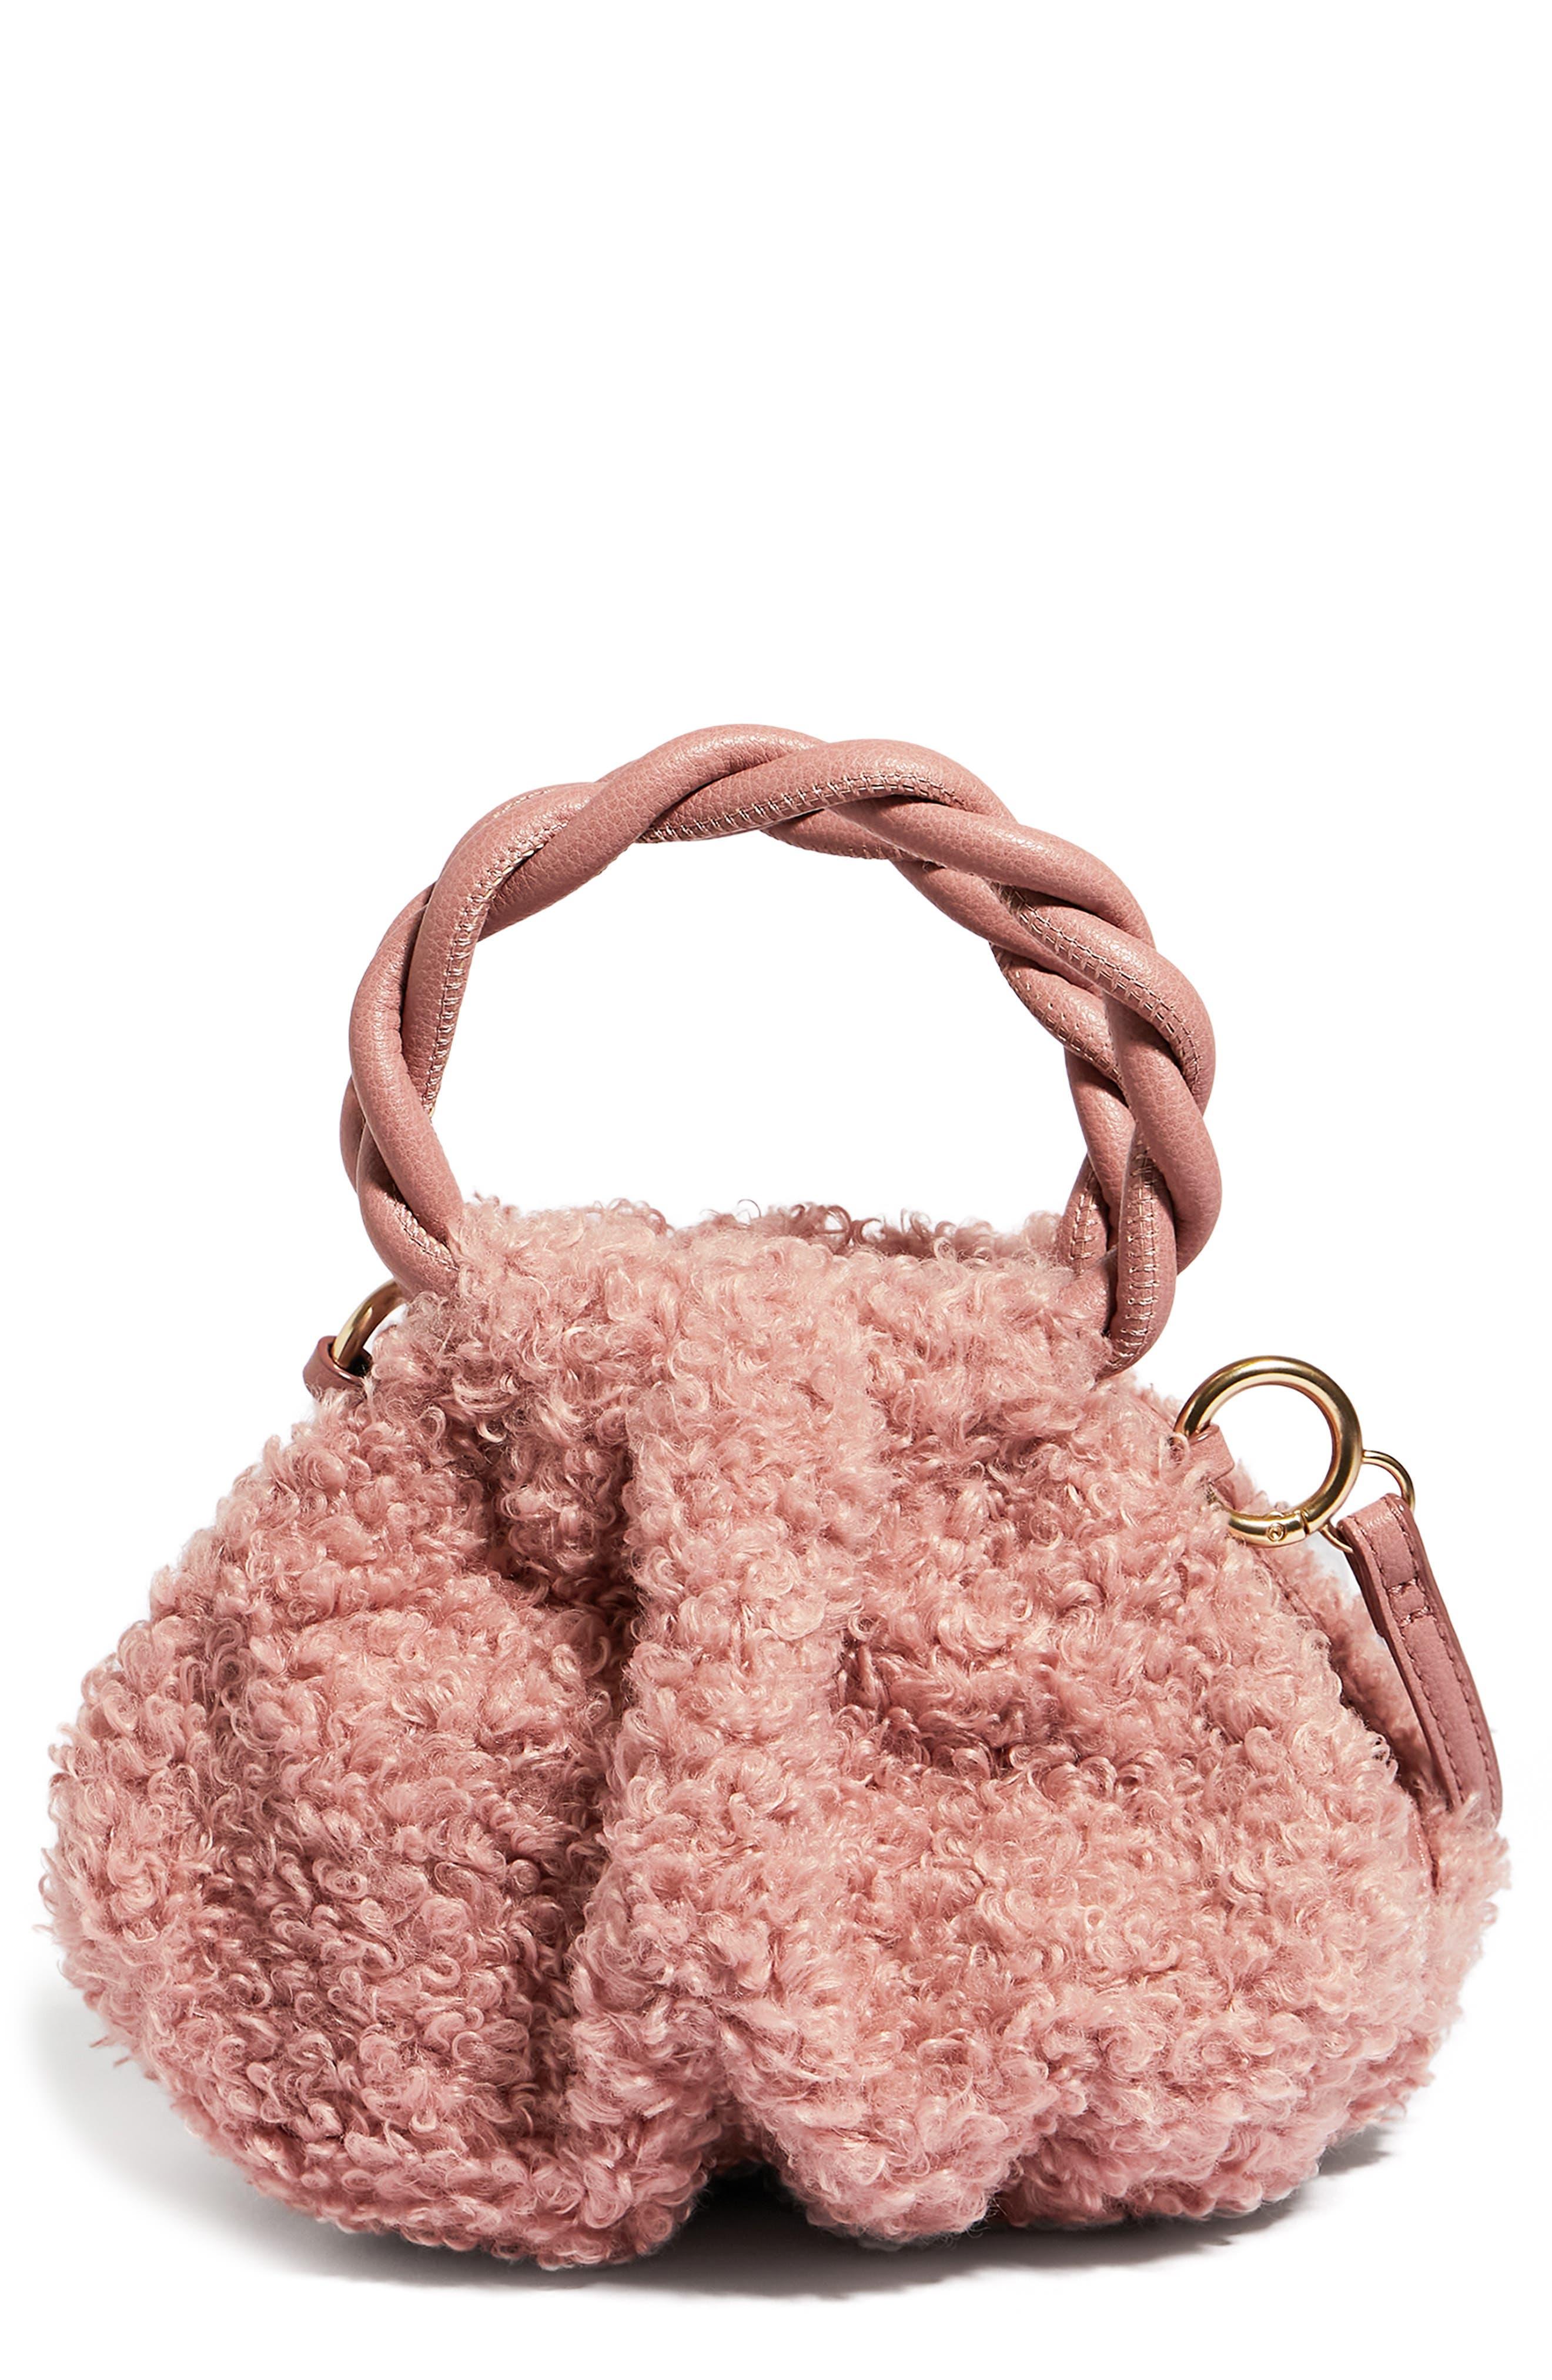 H.o.w. We Are Adorbs Mini Faux Shearling Crossbody Bag